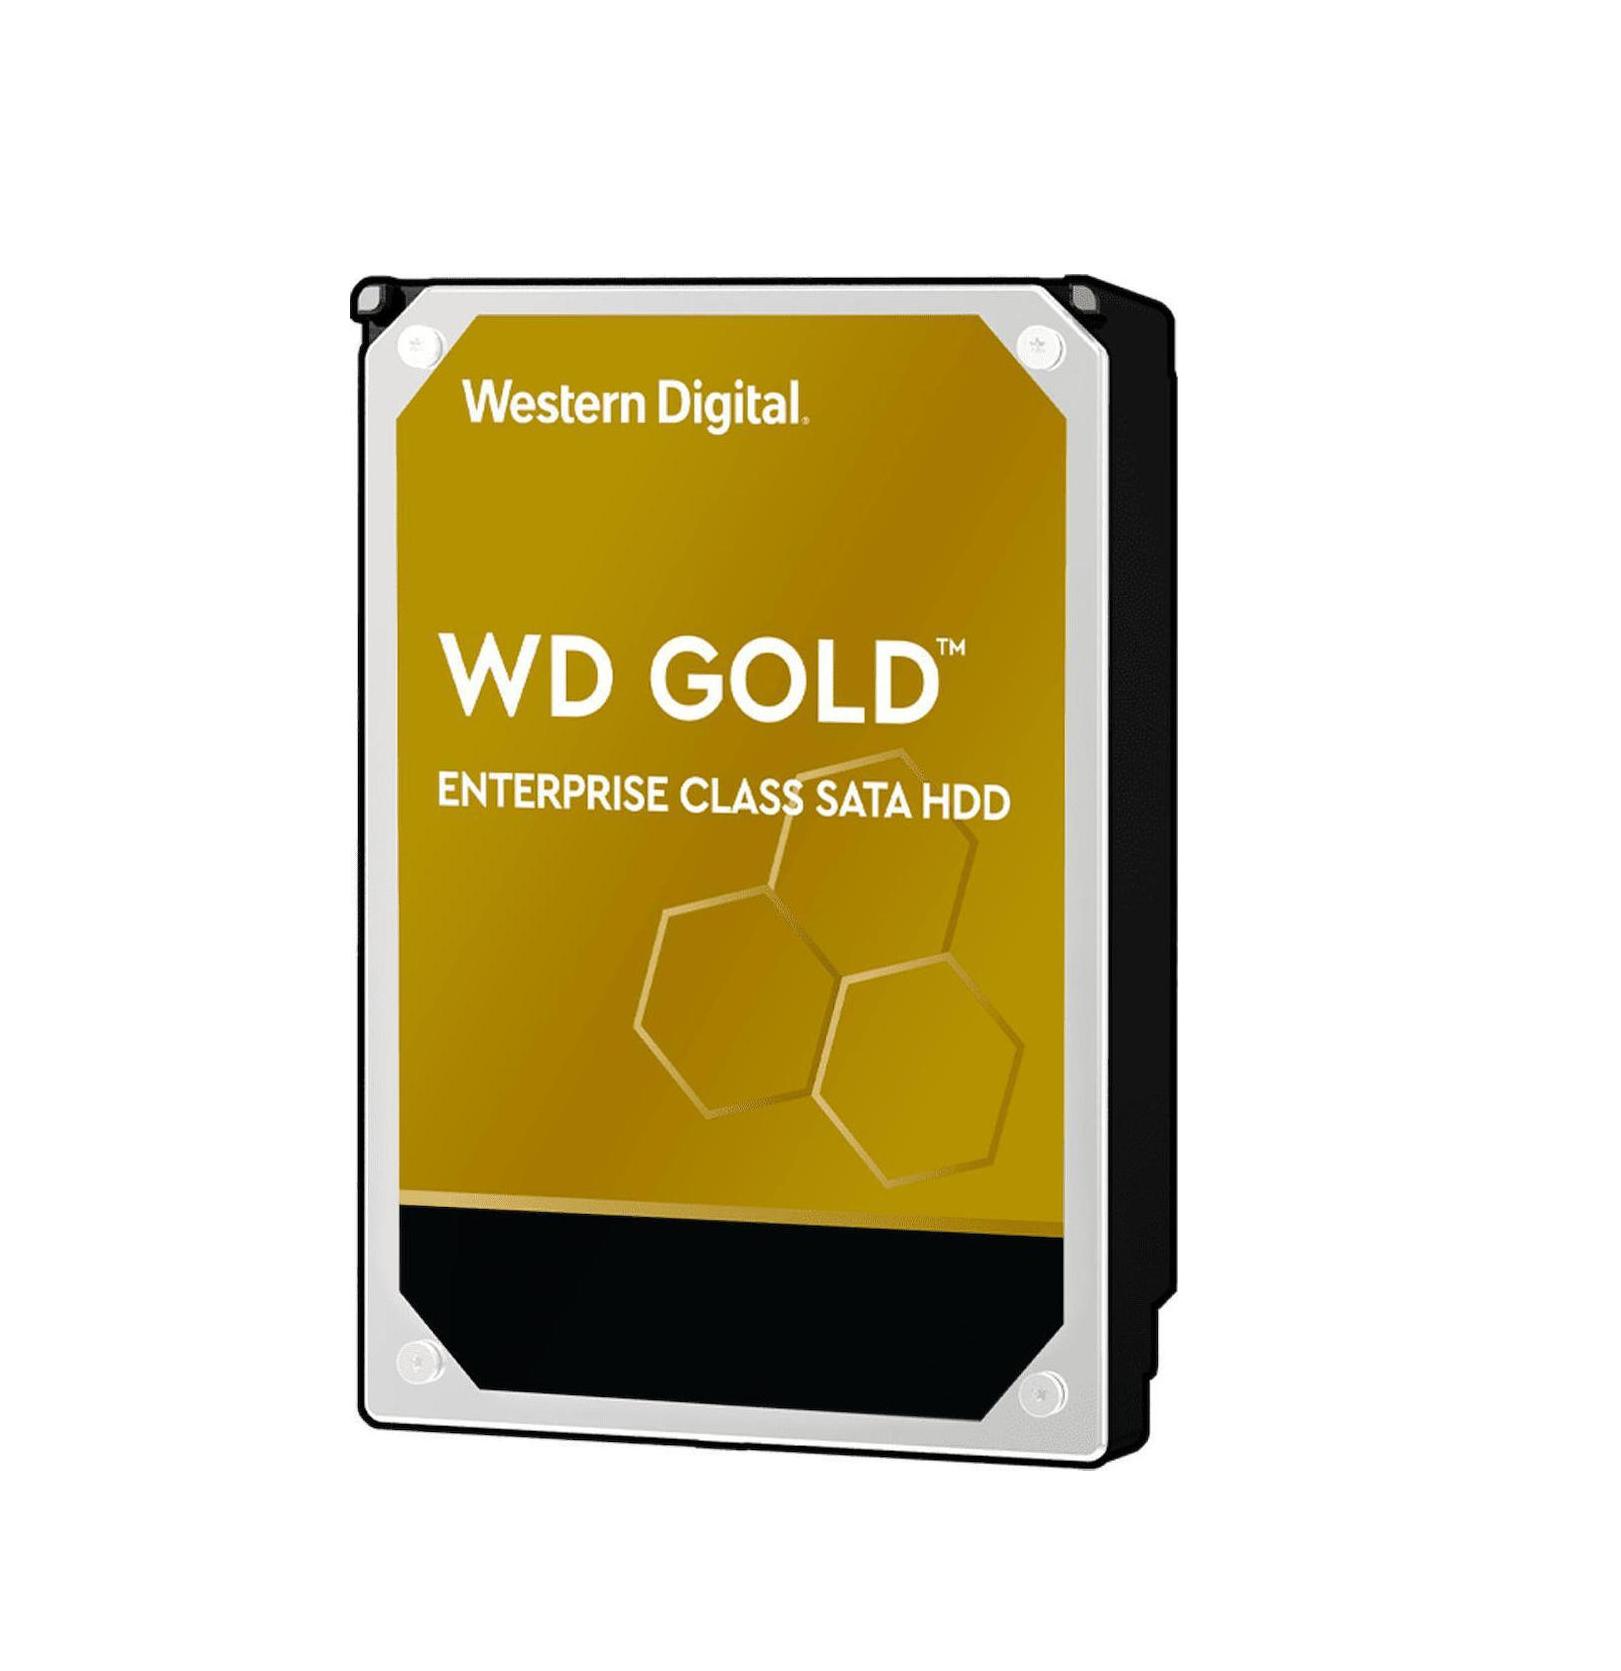 Western Digital Gold Enterprise 4TB WD4003FRYZ Σκληρός Δίσκος Sata 3